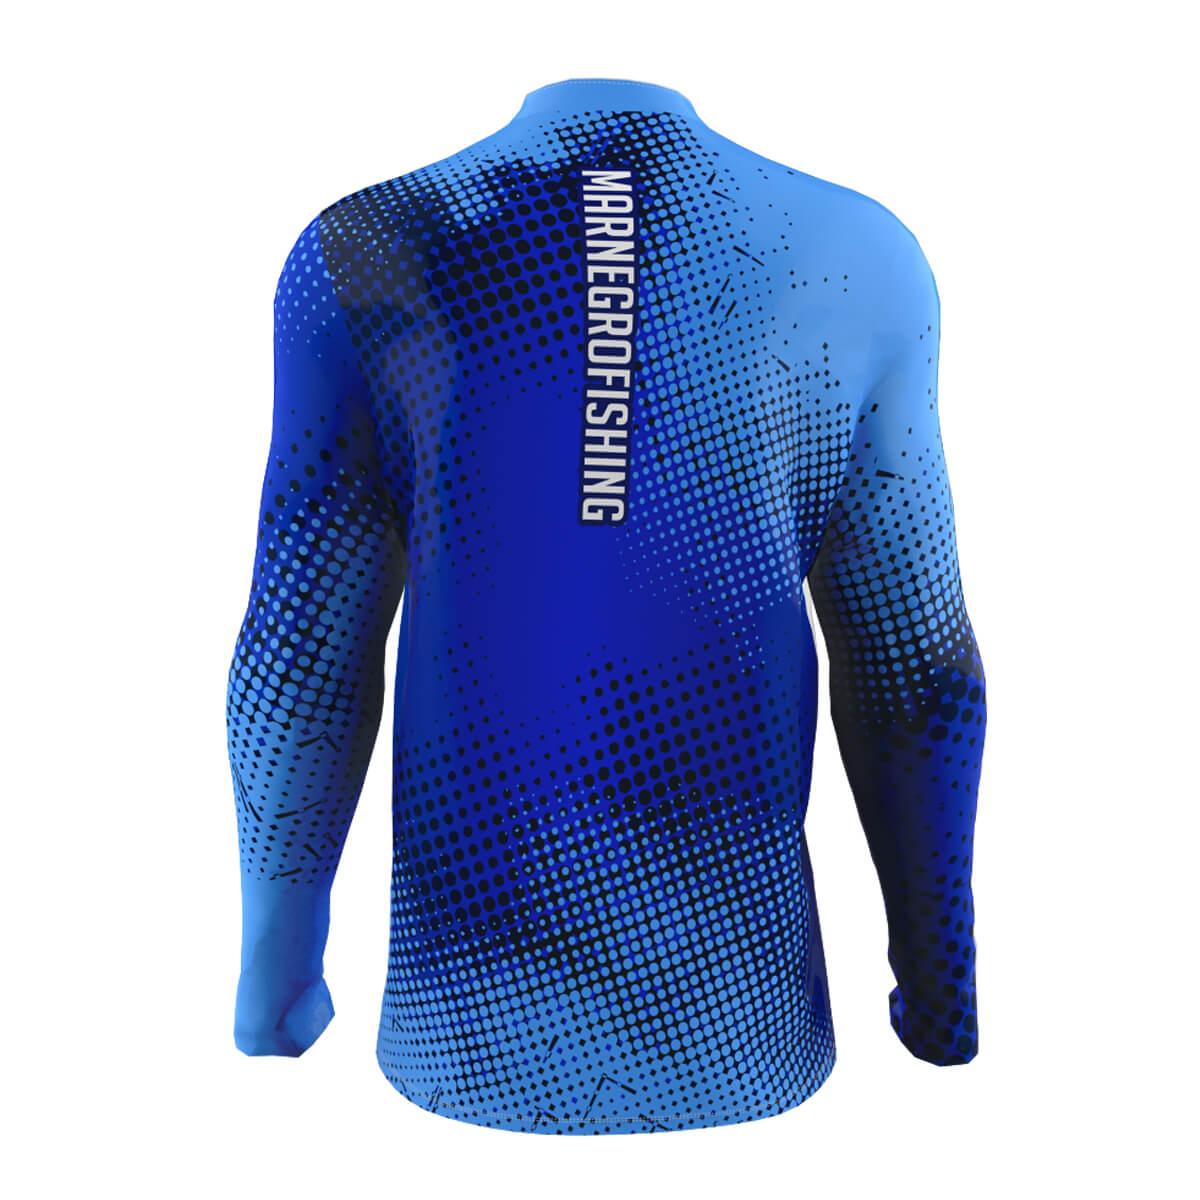 Camiseta de Pesca Mar Negro 2021 Clean Azul  - Pró Pesca Shop